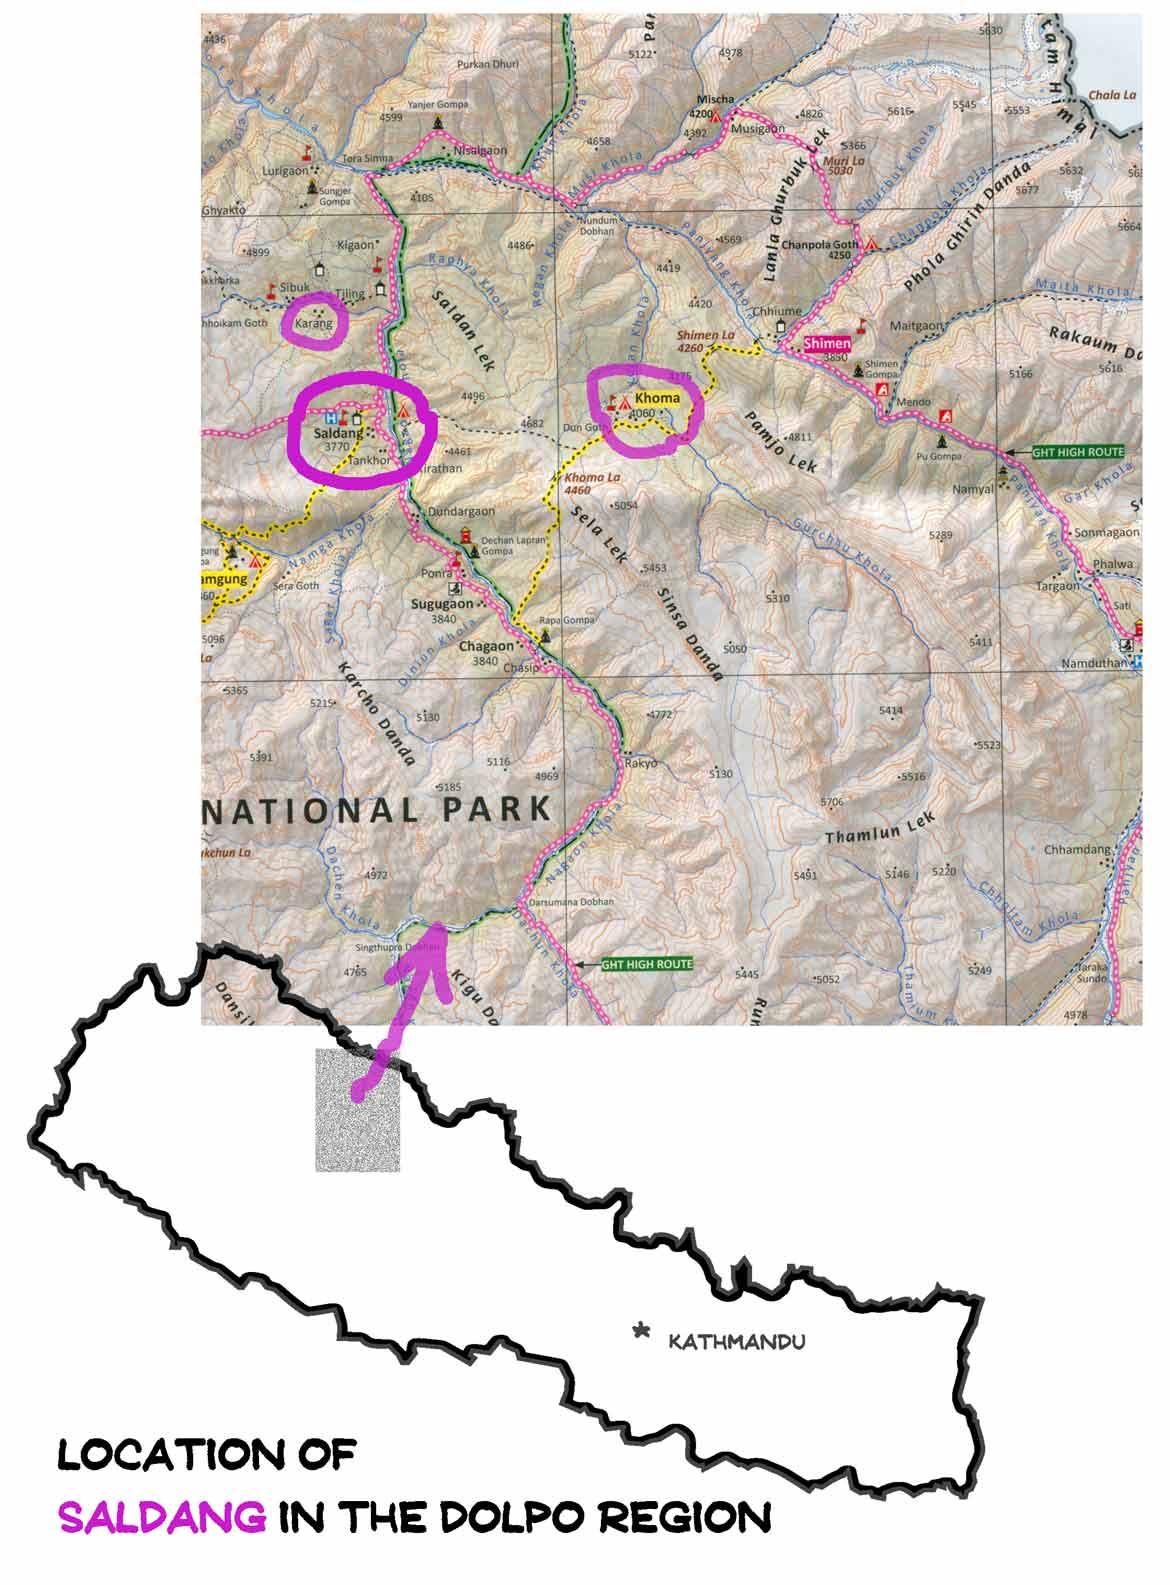 Saldang-in-Nepal-map2-1170-1585